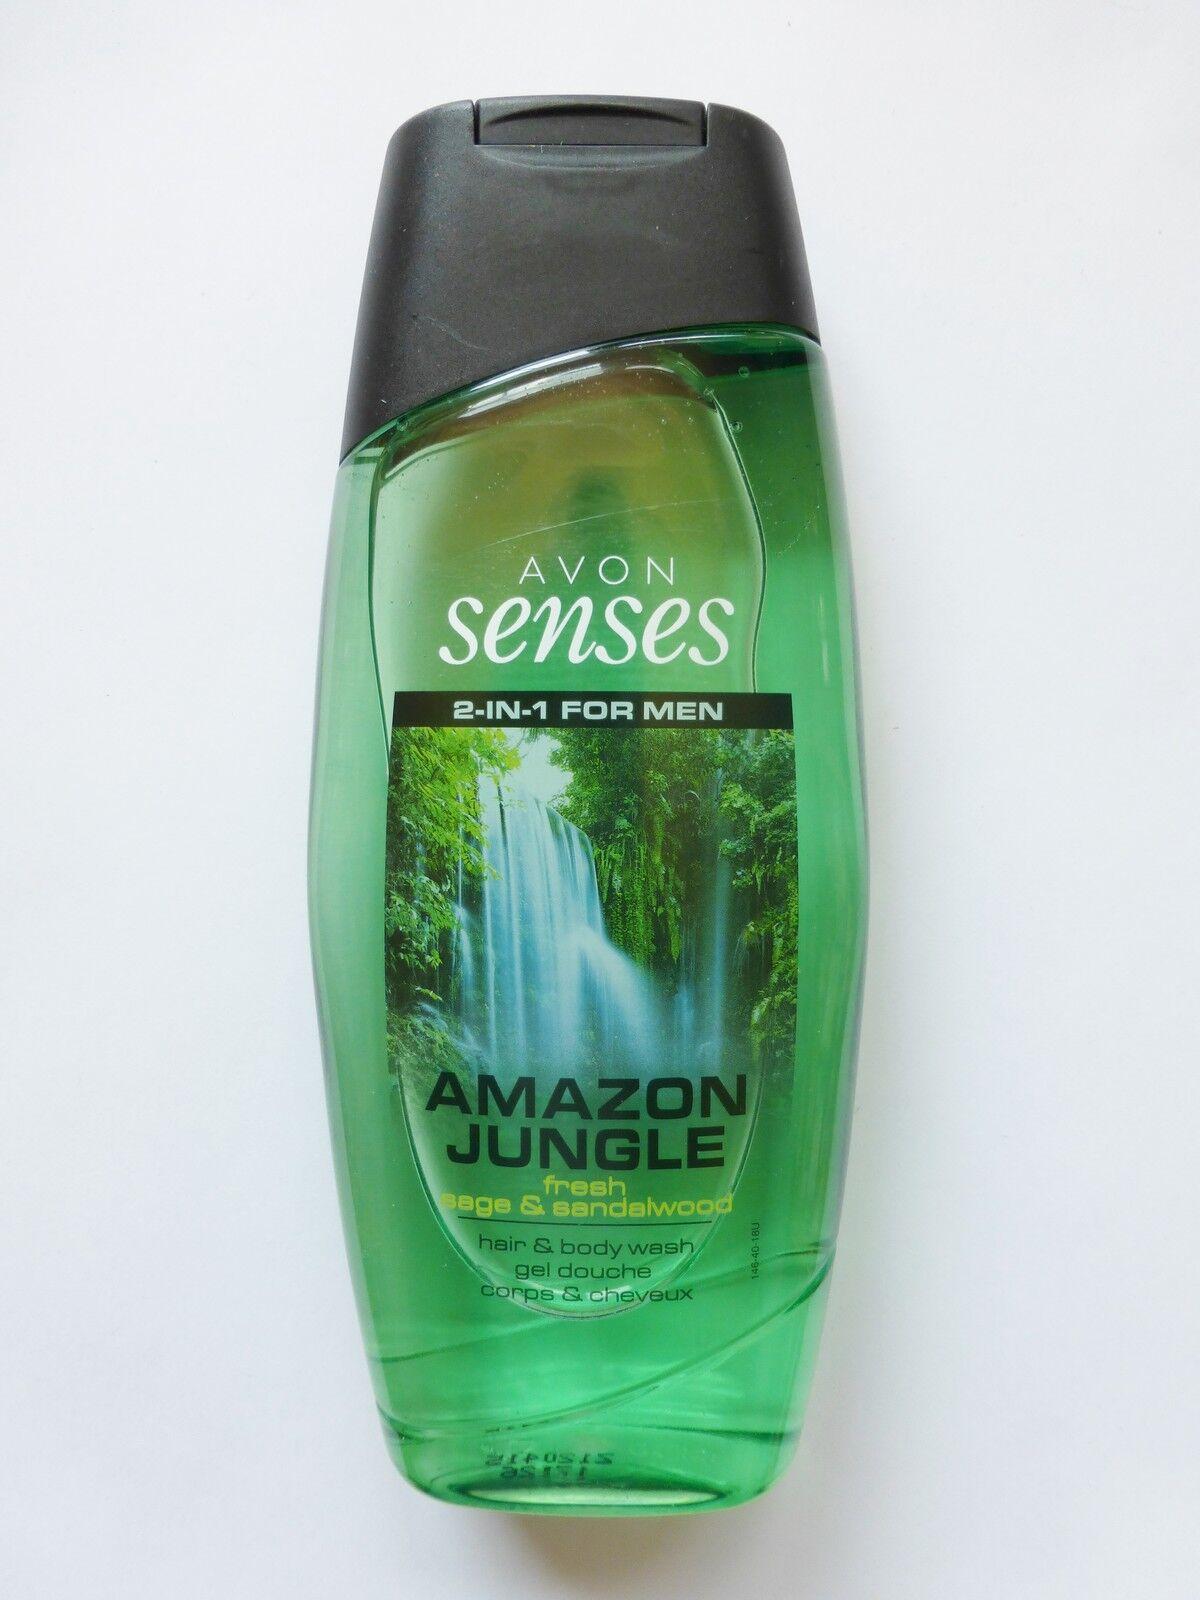 1L/5,96€ Avon Senses Amazon Jungle Shampoo & Duschgel For Men Salbei +Sandelholz